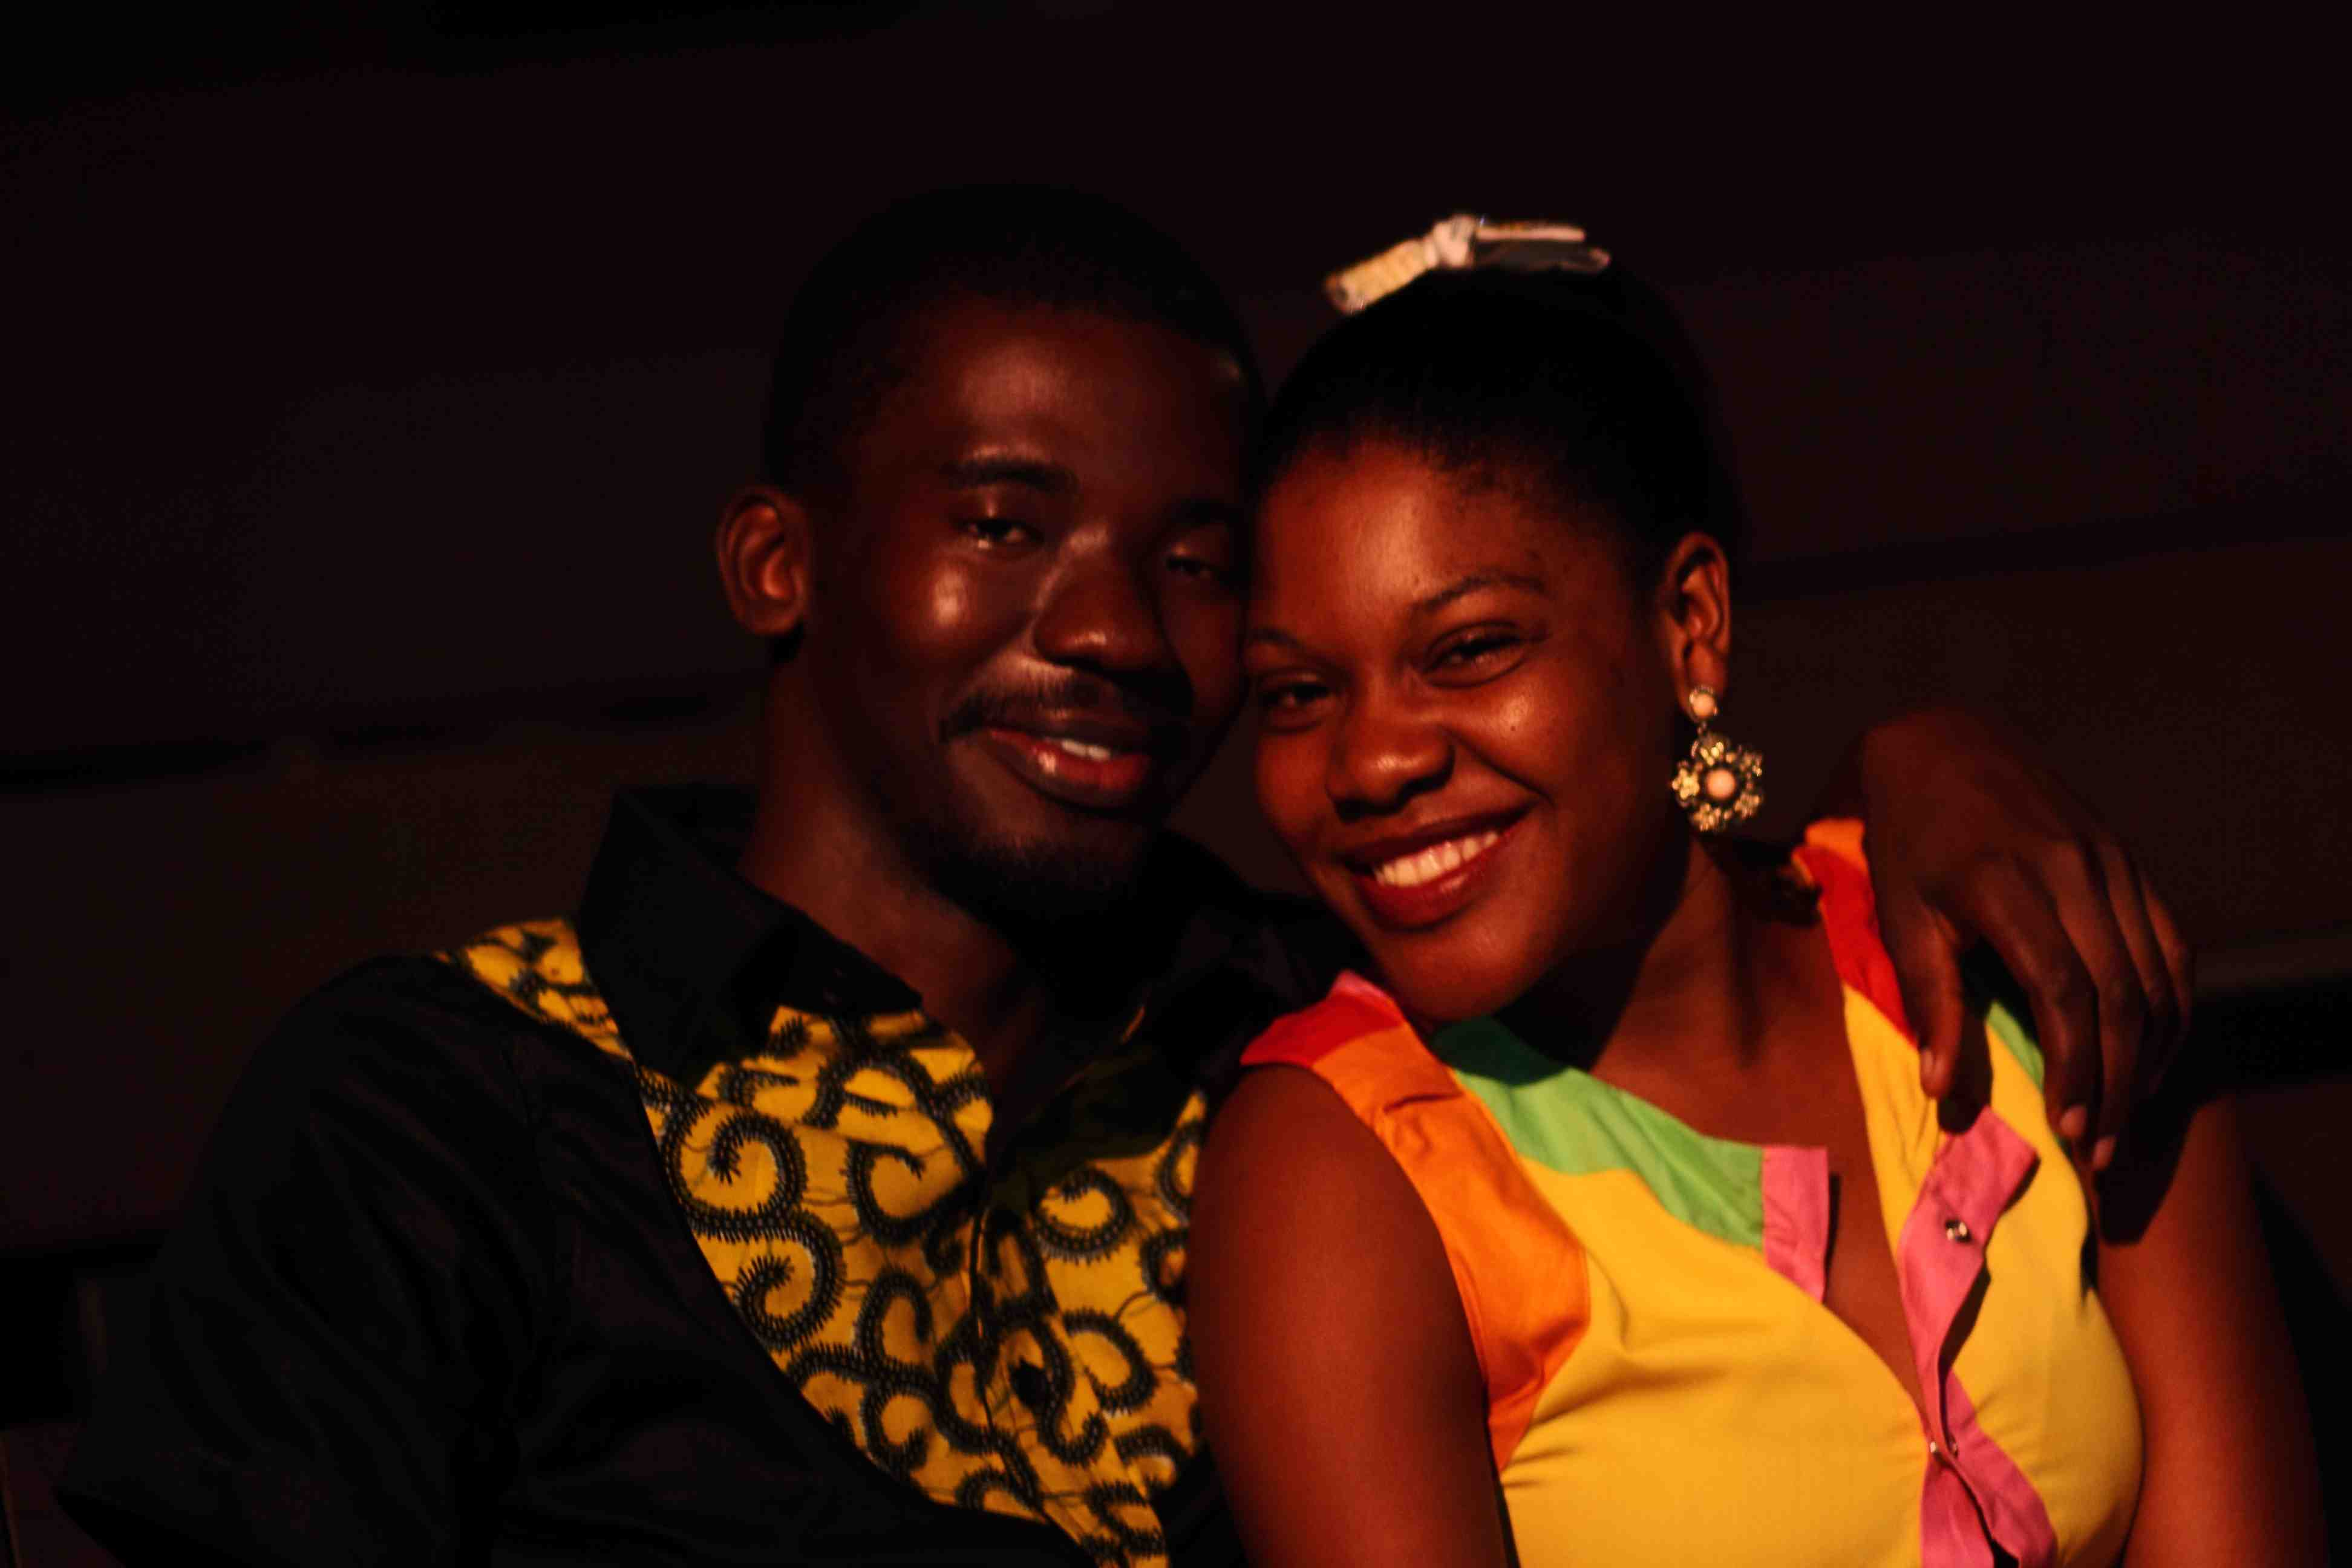 Couple - IND!E FUSE - photo by ACCRA [dot] ALT